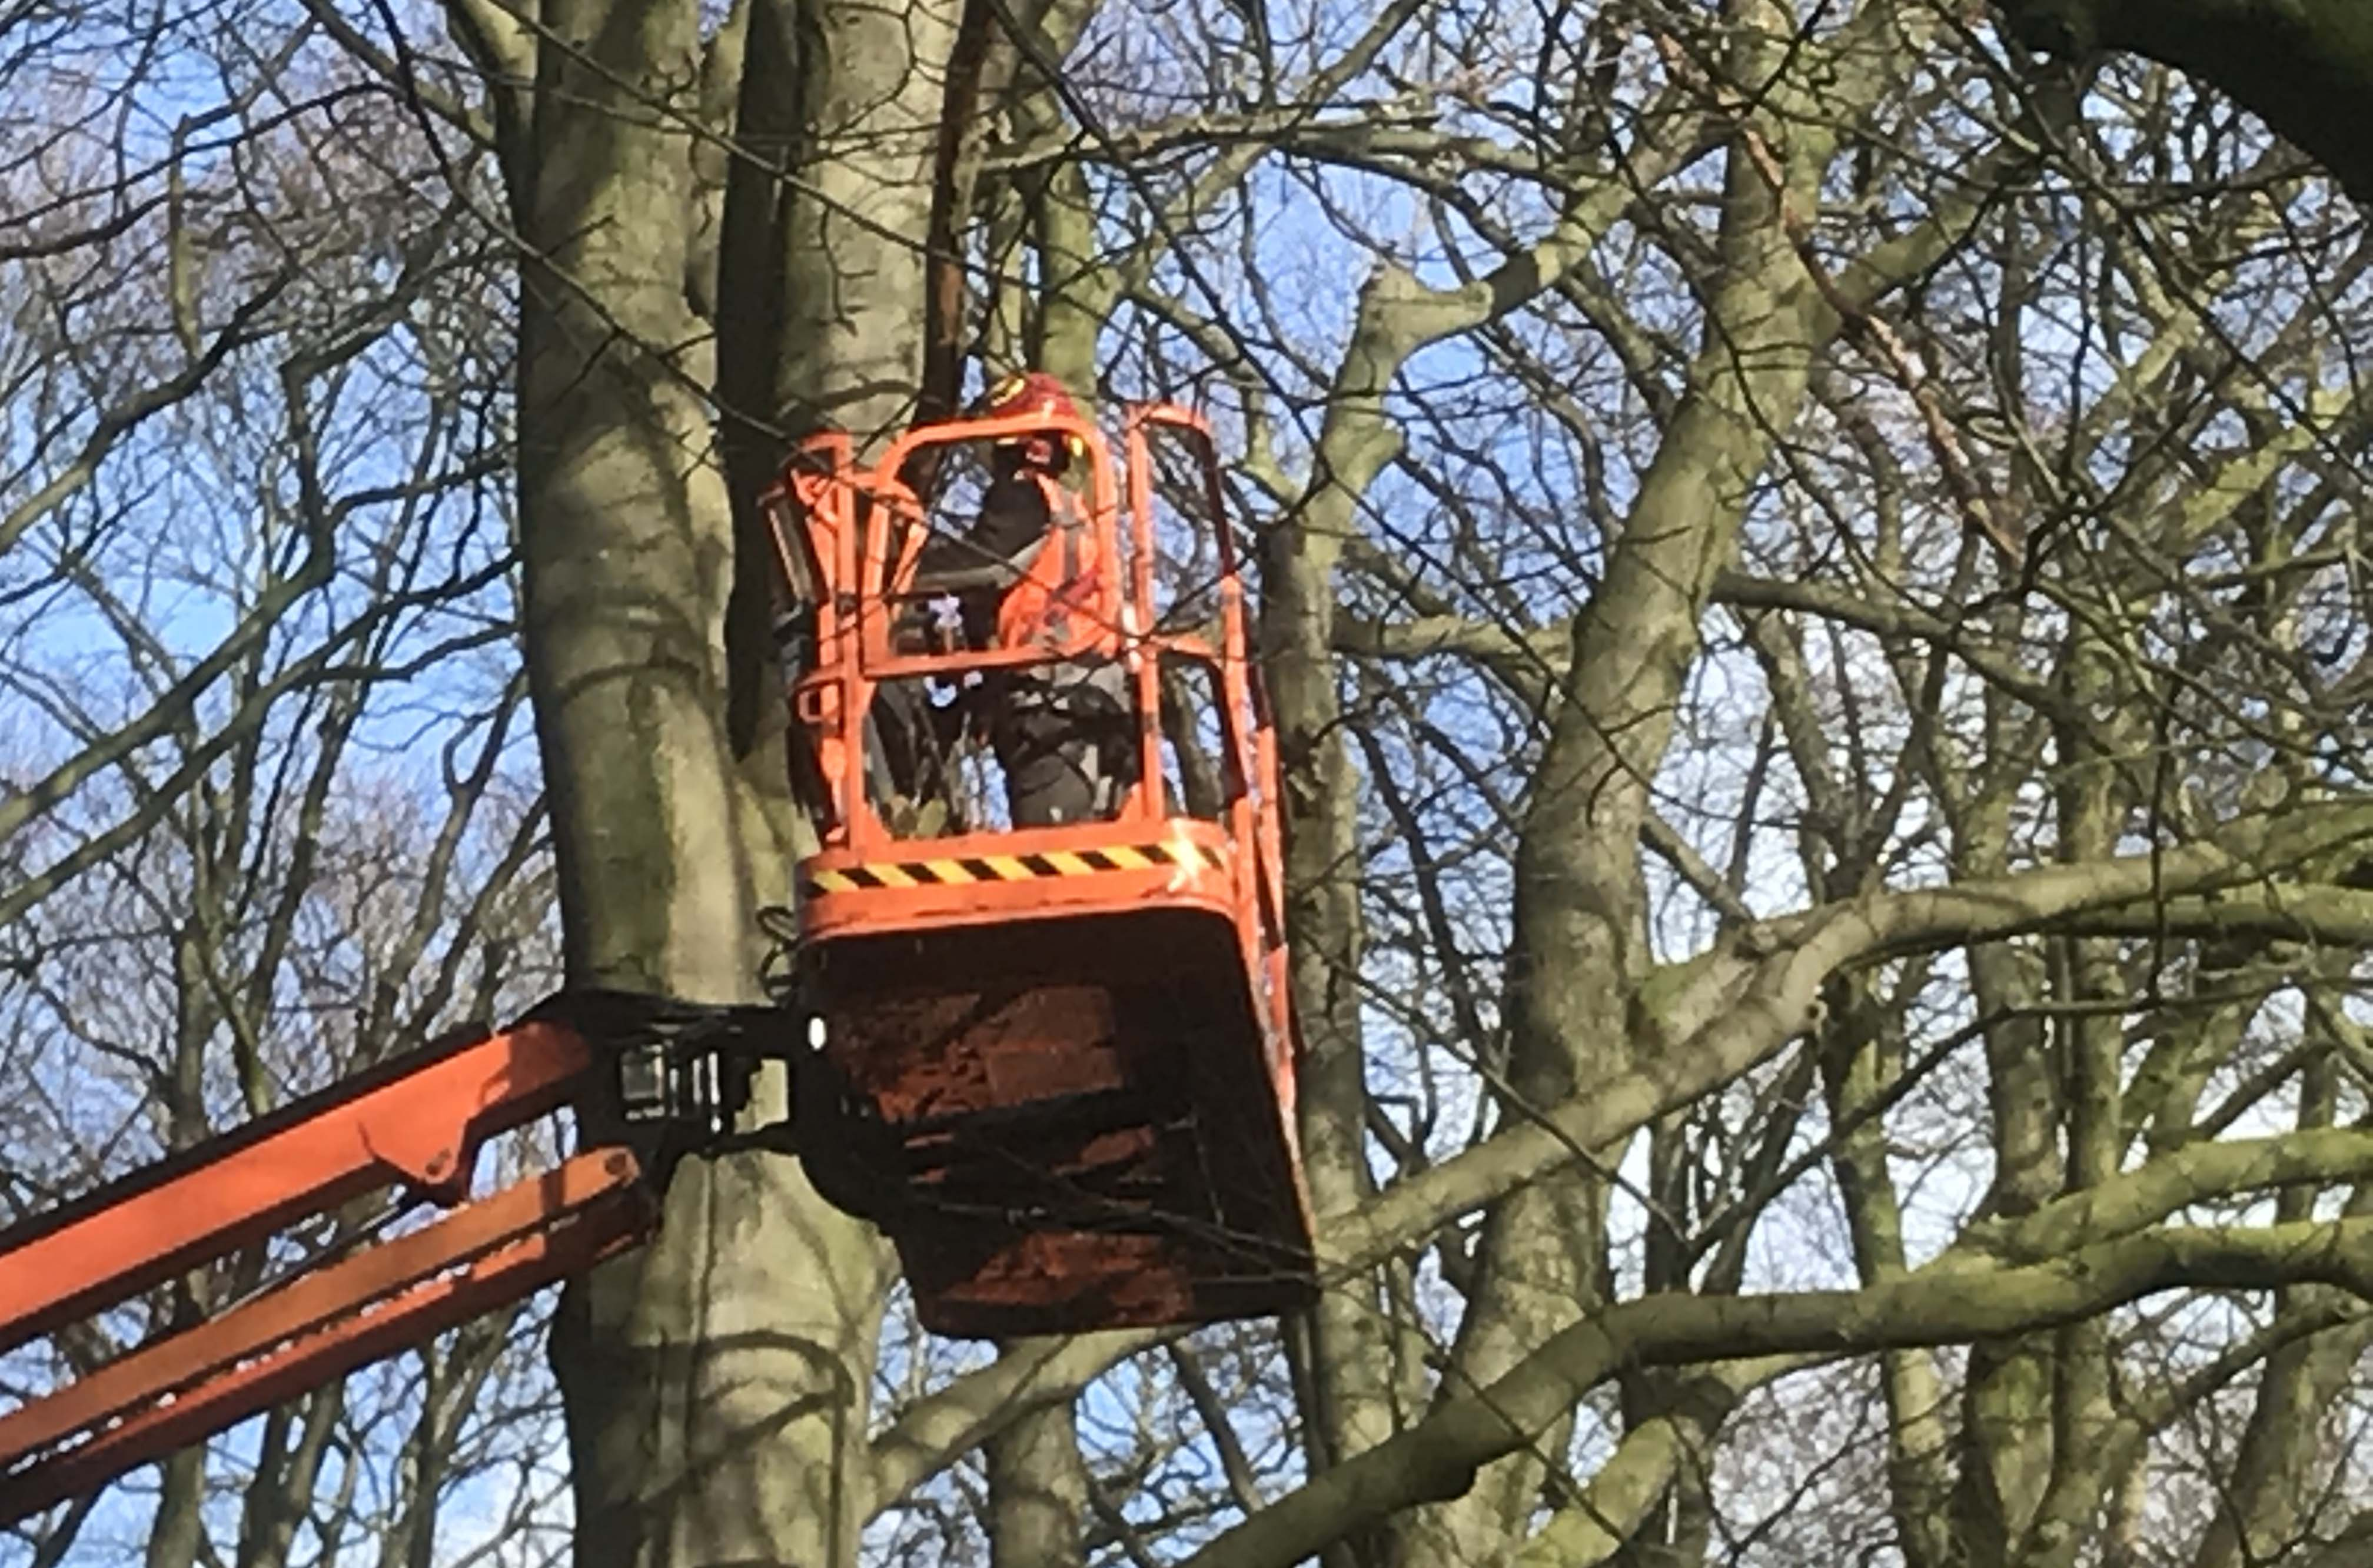 Hoefakker boomspecialisten snoeien monumentale beuken Geldersch Landschap (4m)